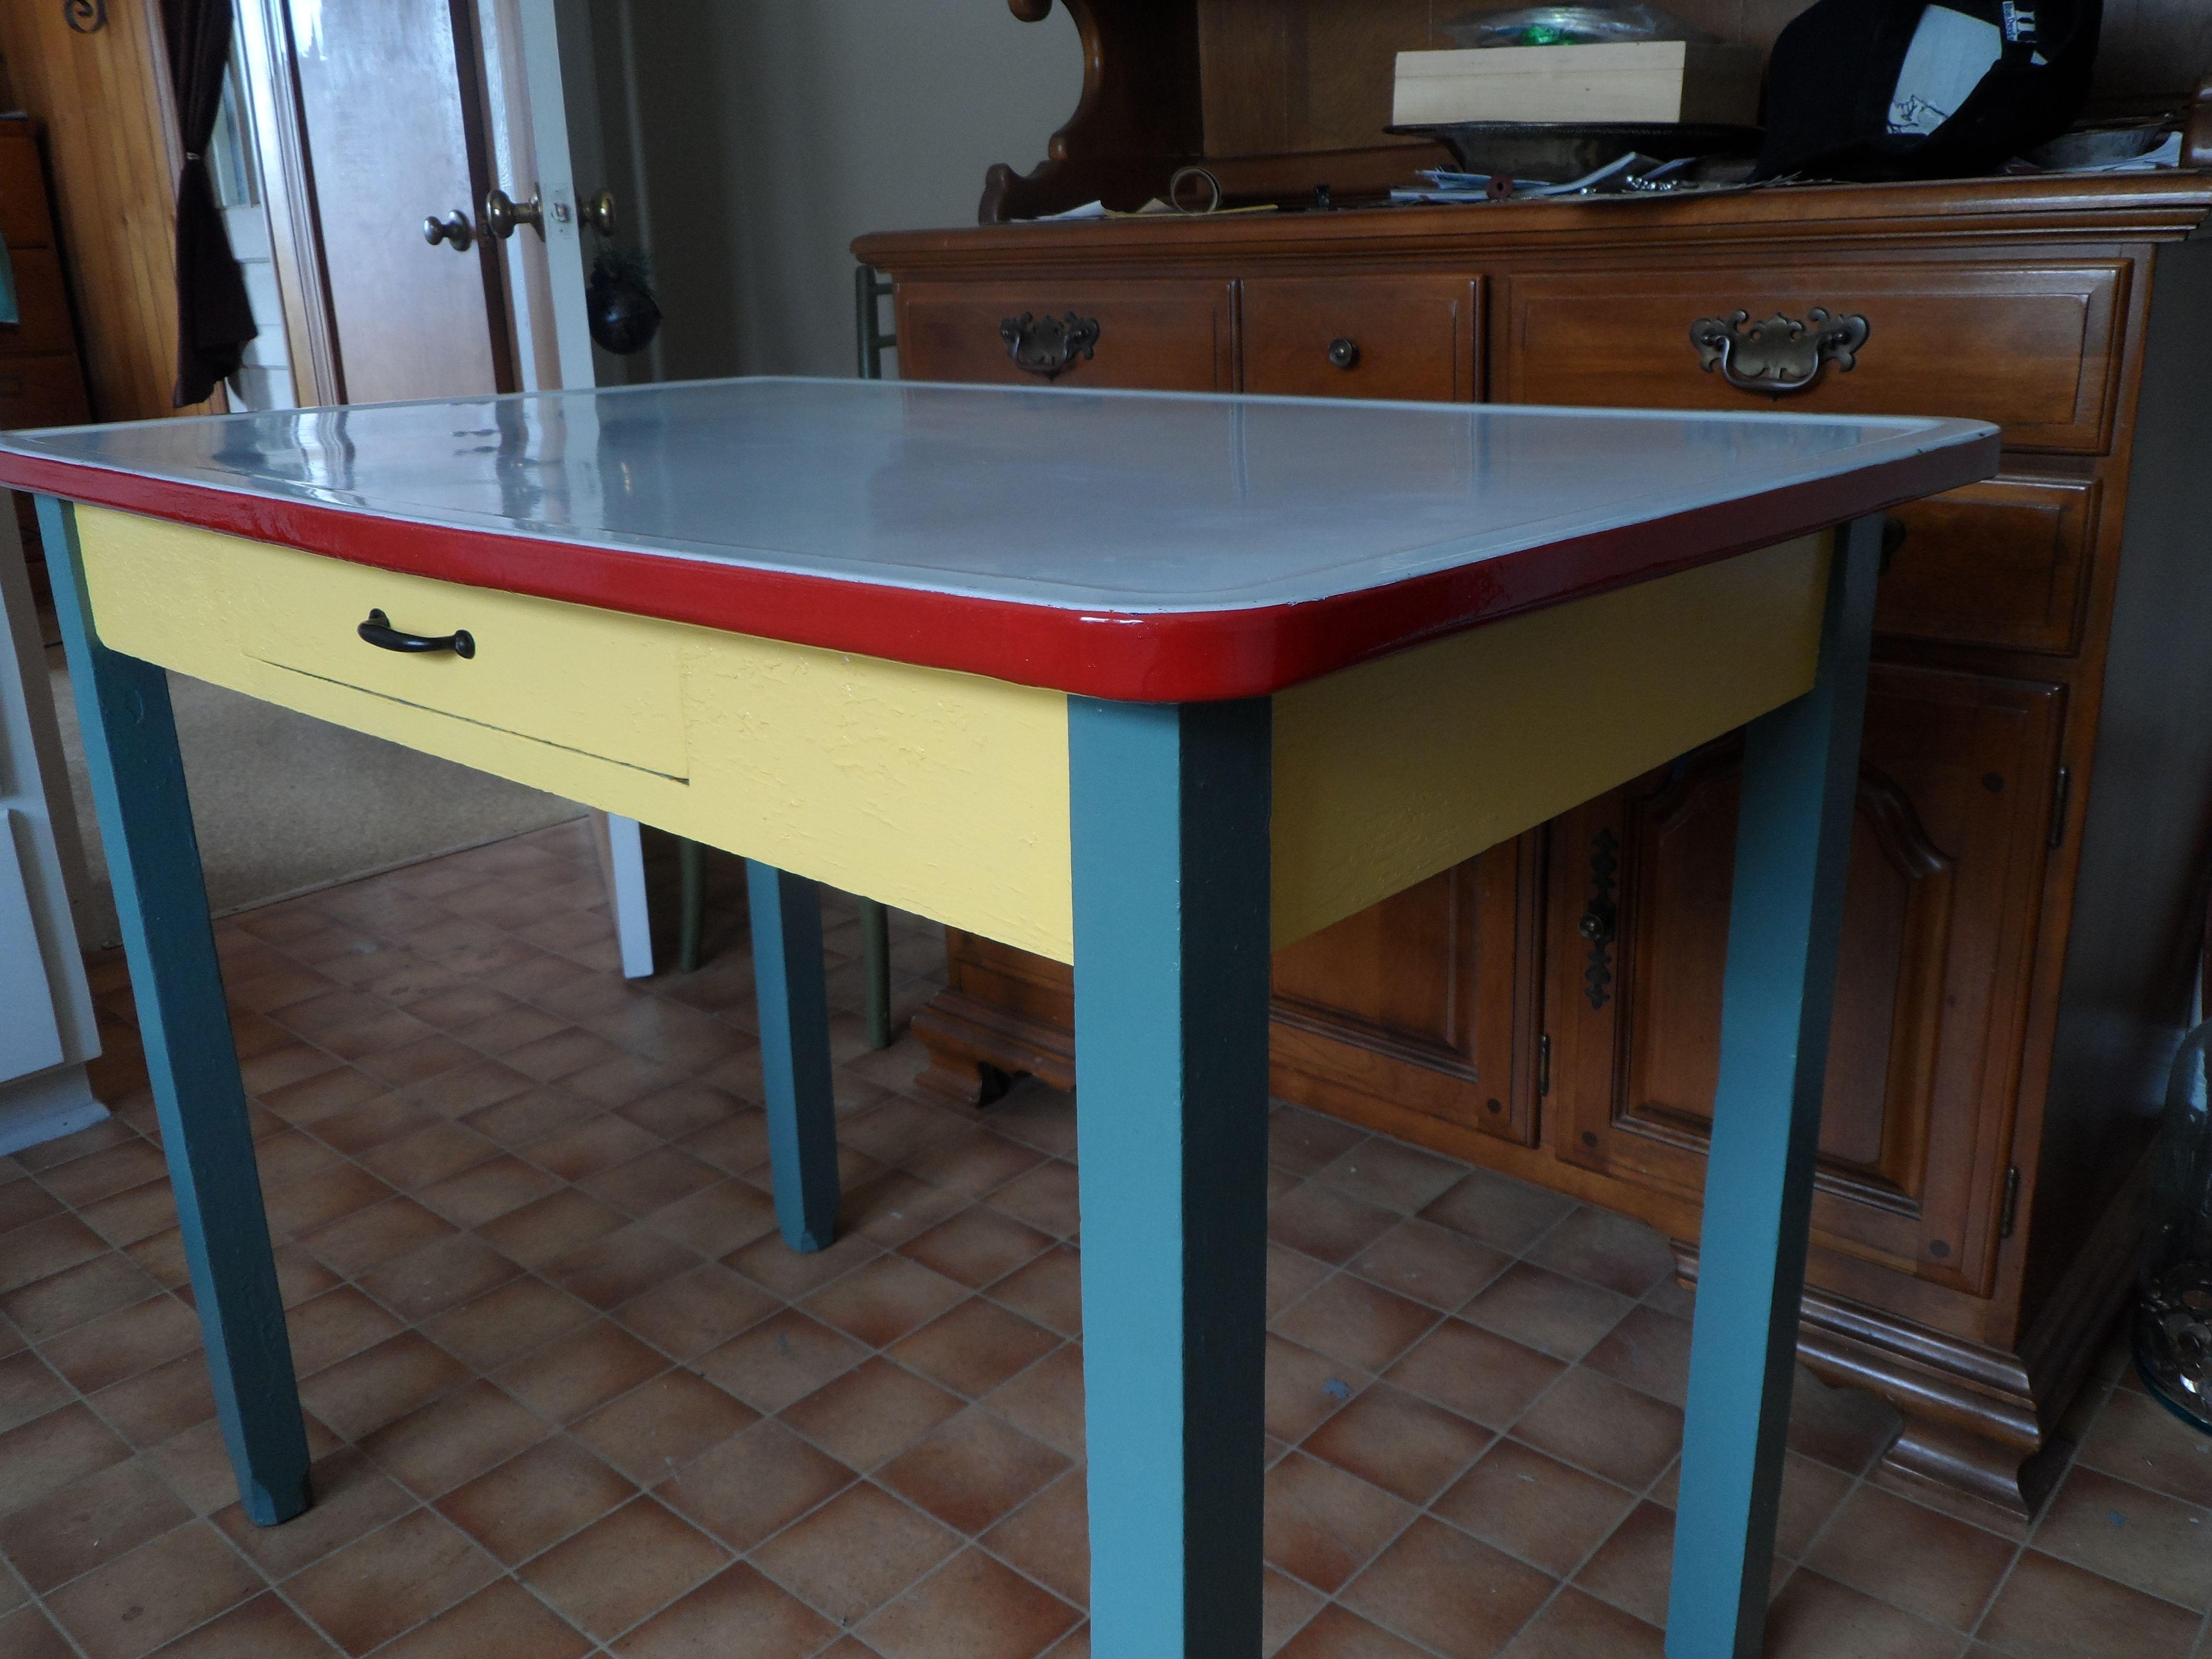 Vintage Enamel Table 150 00 My Projects Vintage